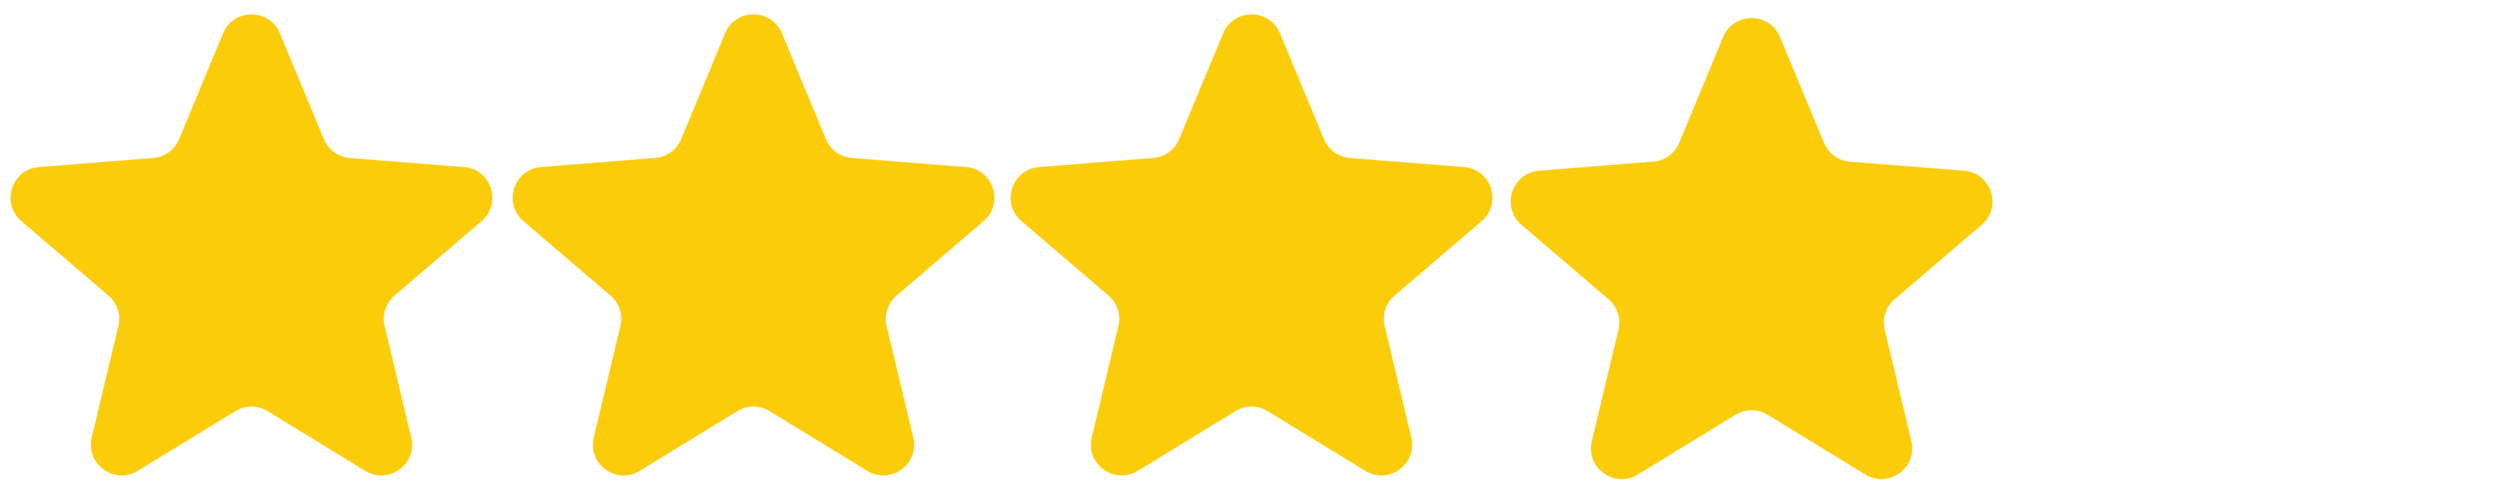 - (4 stars)